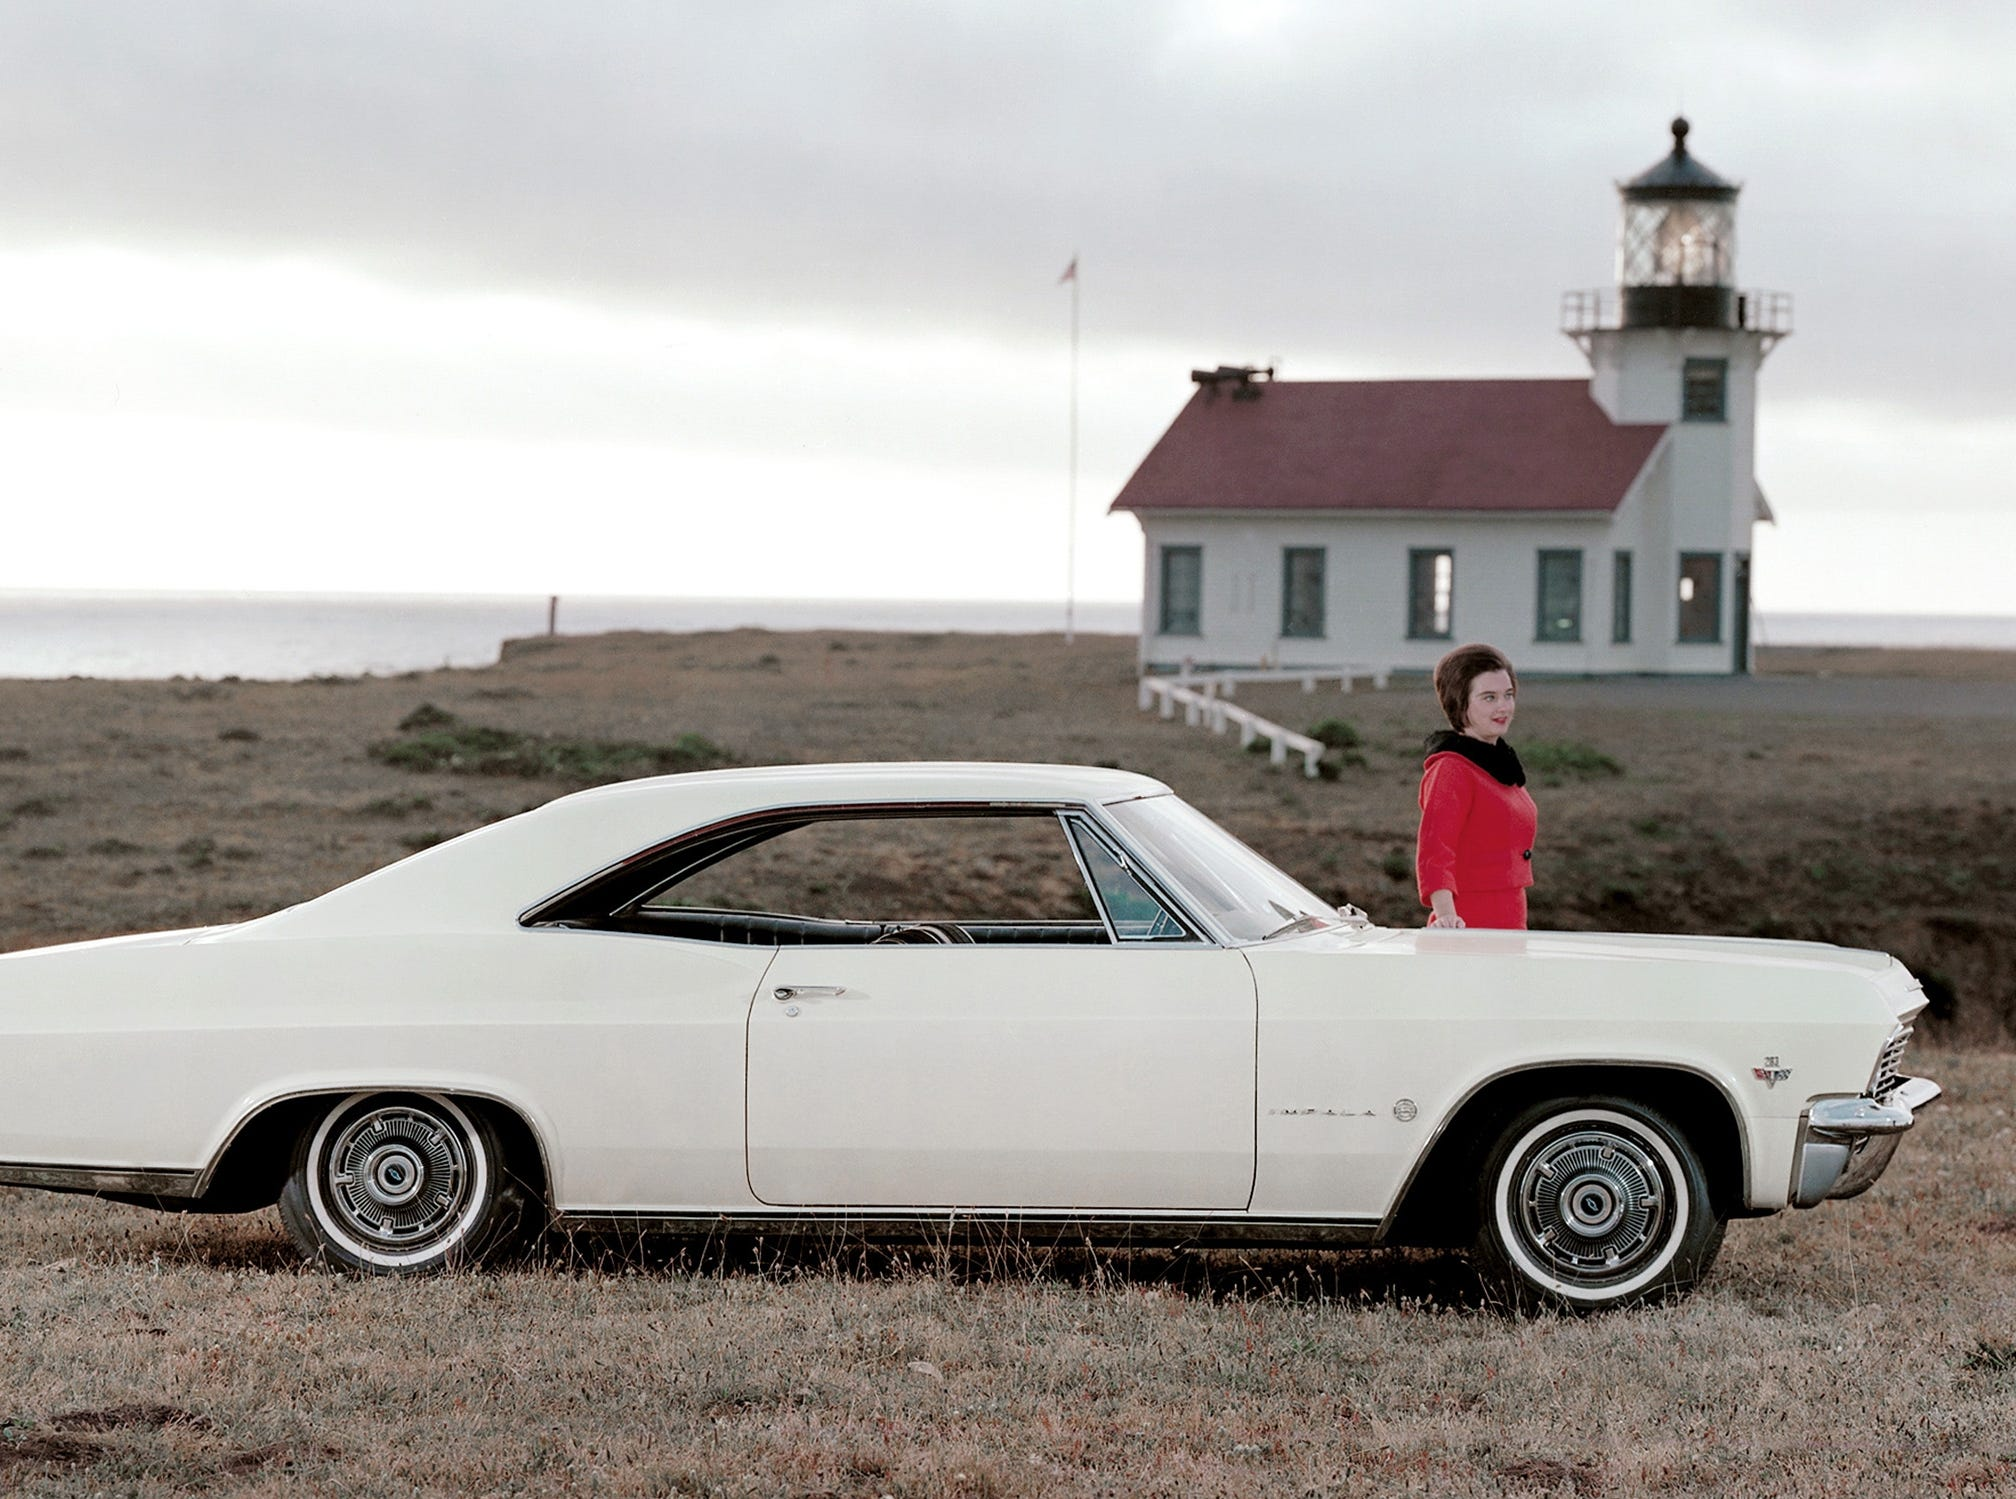 A 1965 Chevrolet Impala Sport Coupe